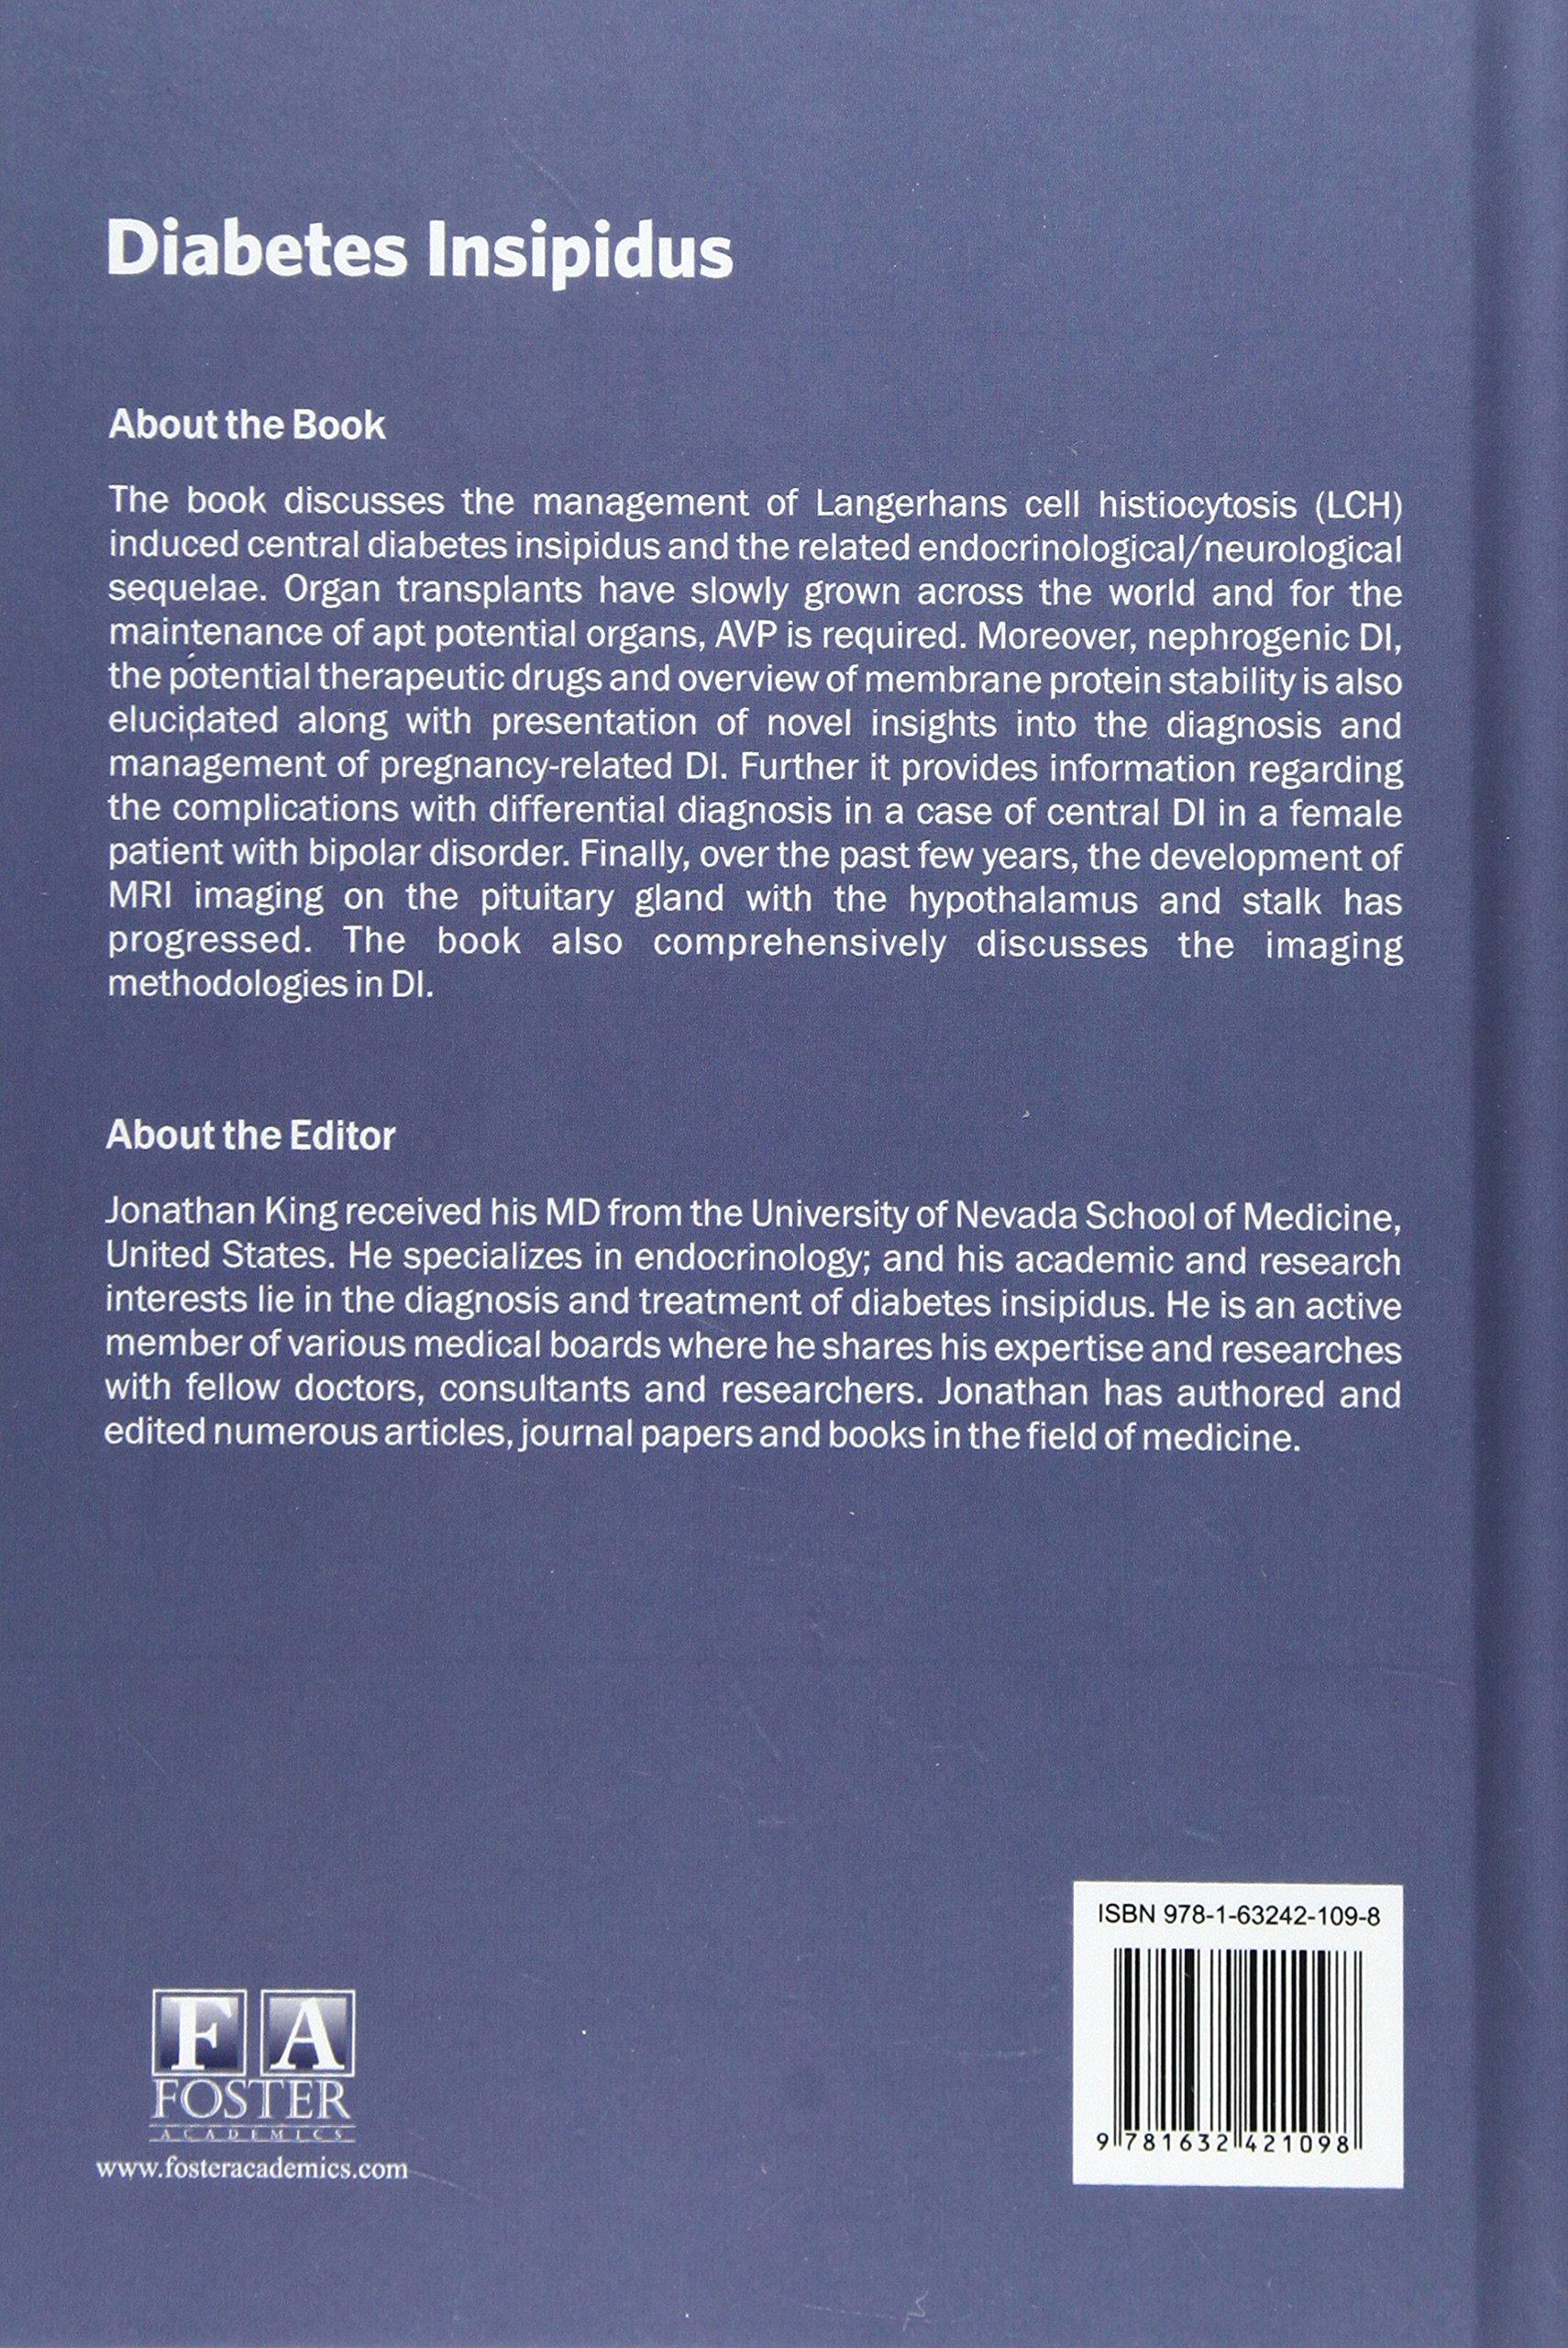 Diabetes Insipidus Jonathan King 9781632421098 Amazoncom Books